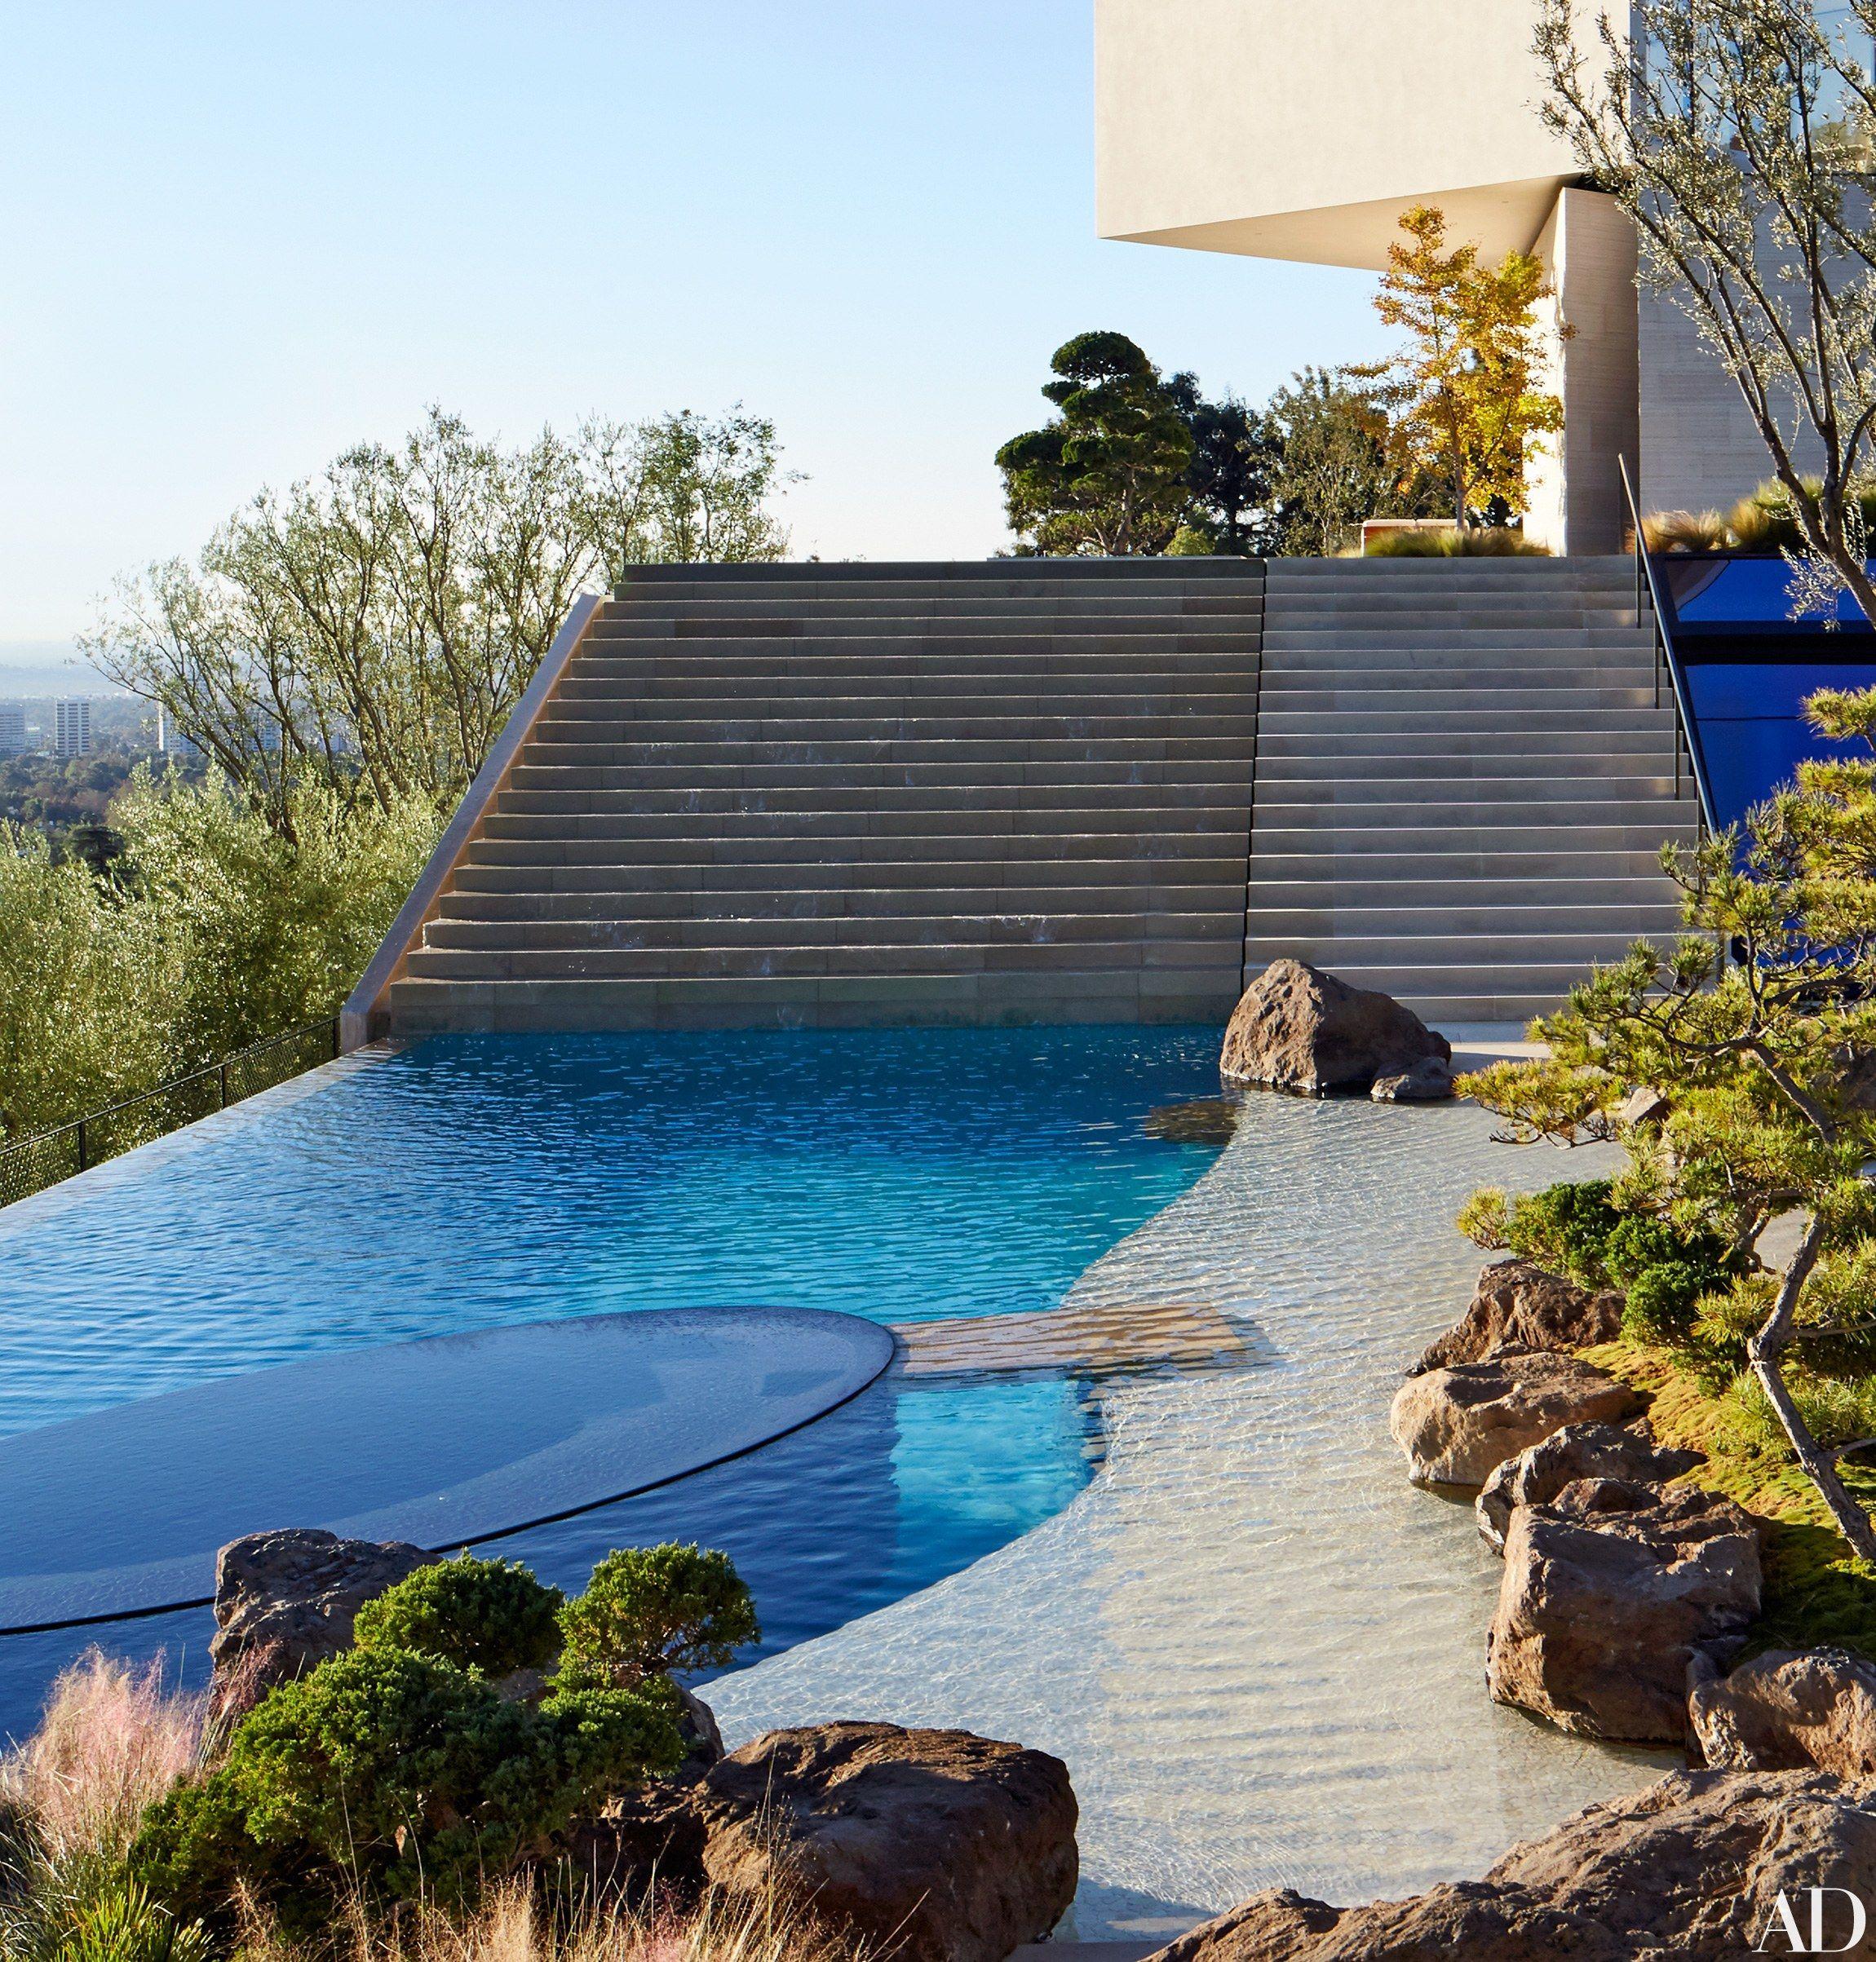 15 Beautifully Designed Swimming Pools Swimming Pool Designs Swimming Pools Cool Pools